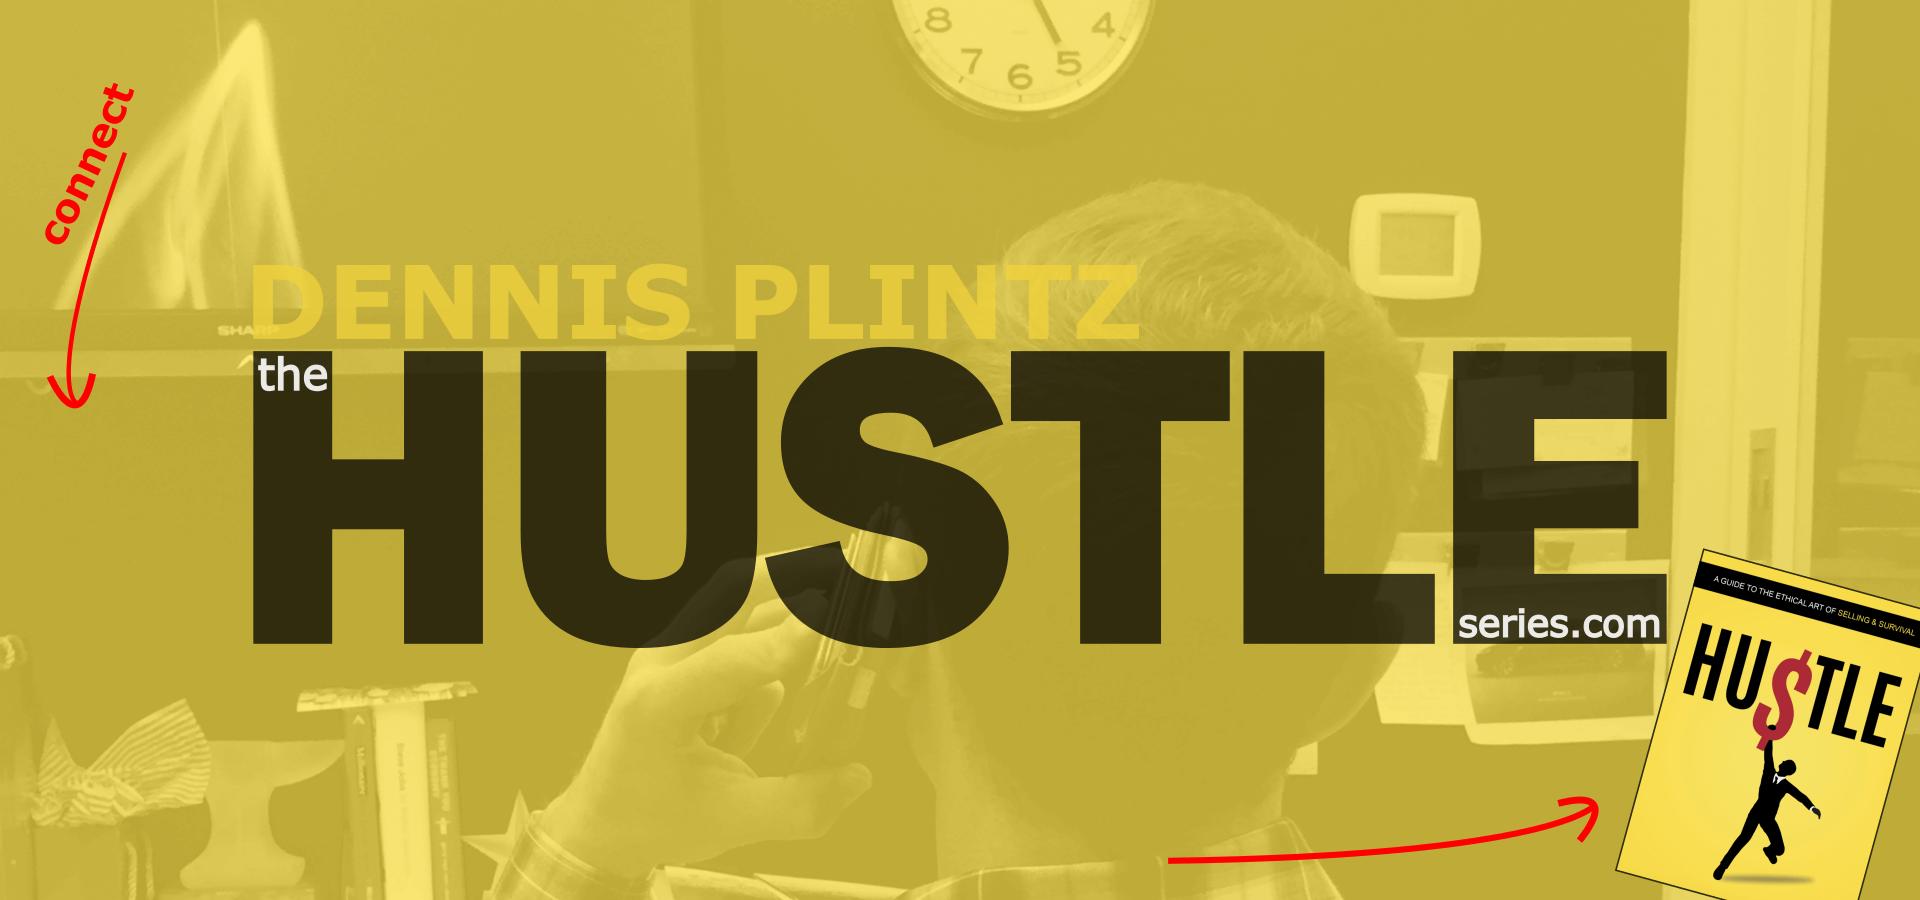 The Hustle Series by Dennis Plintz home slider